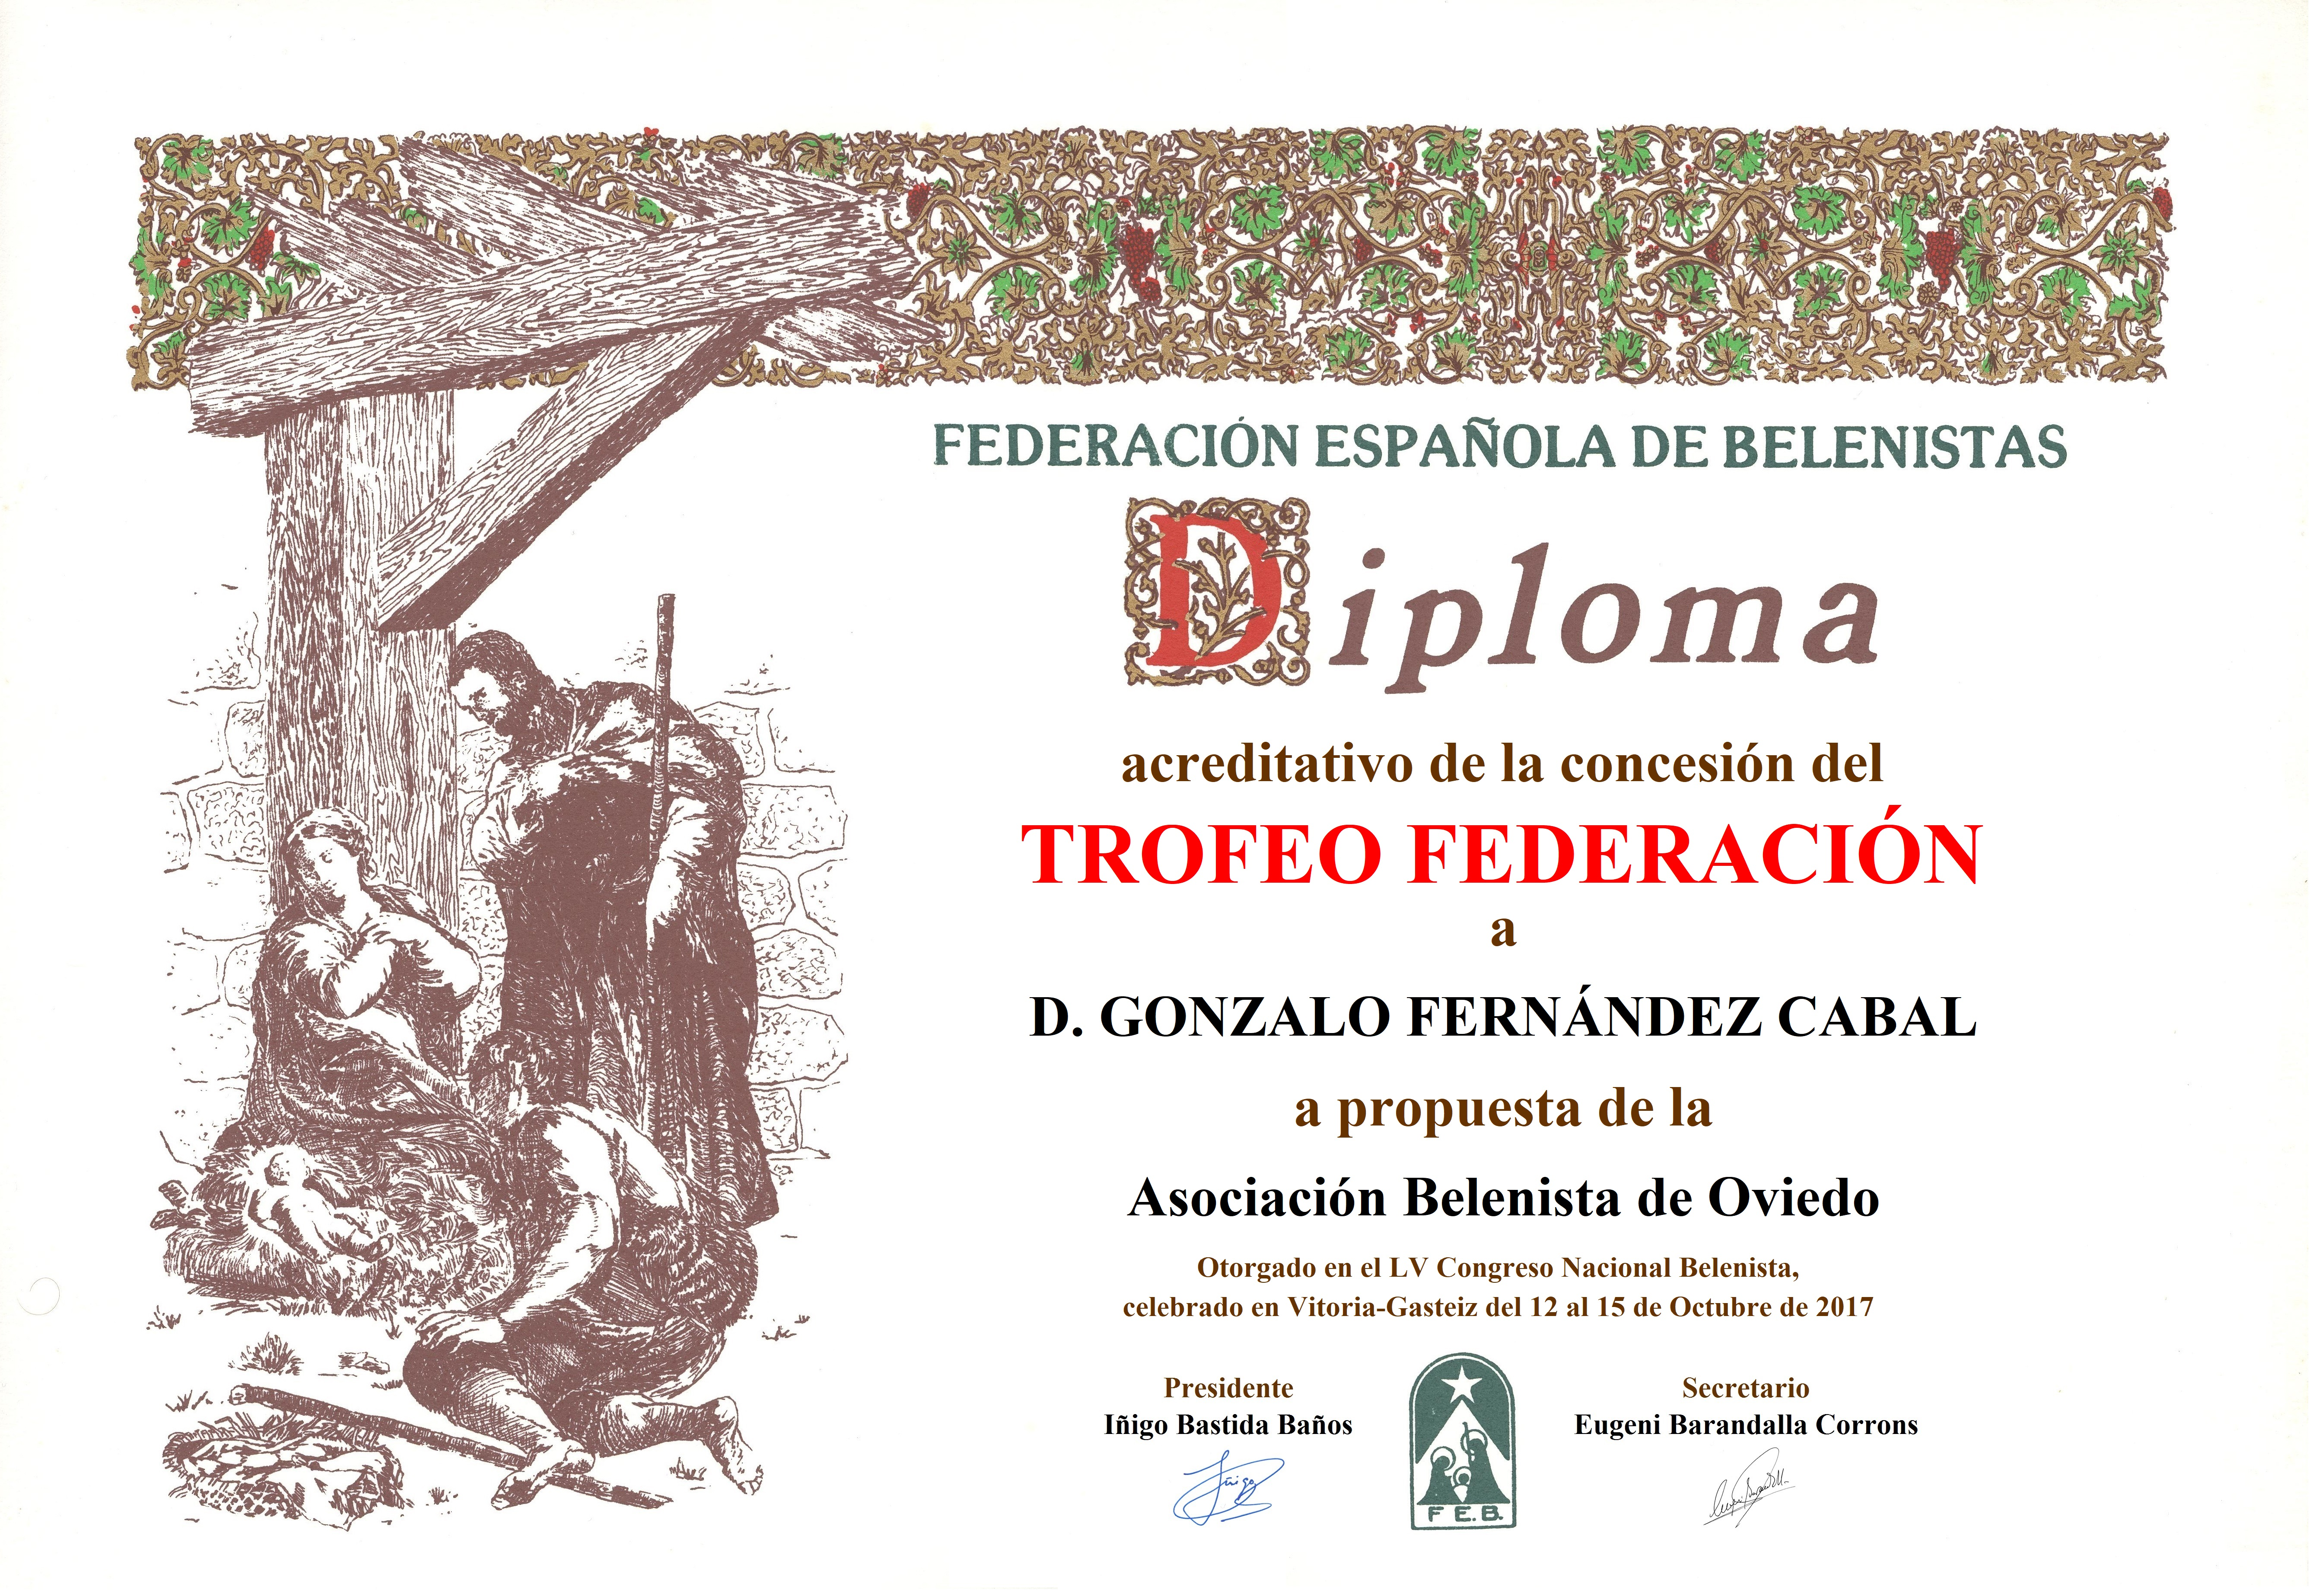 Gonzalo Fernández Cabal - Diploma Trofeo FEB 2017